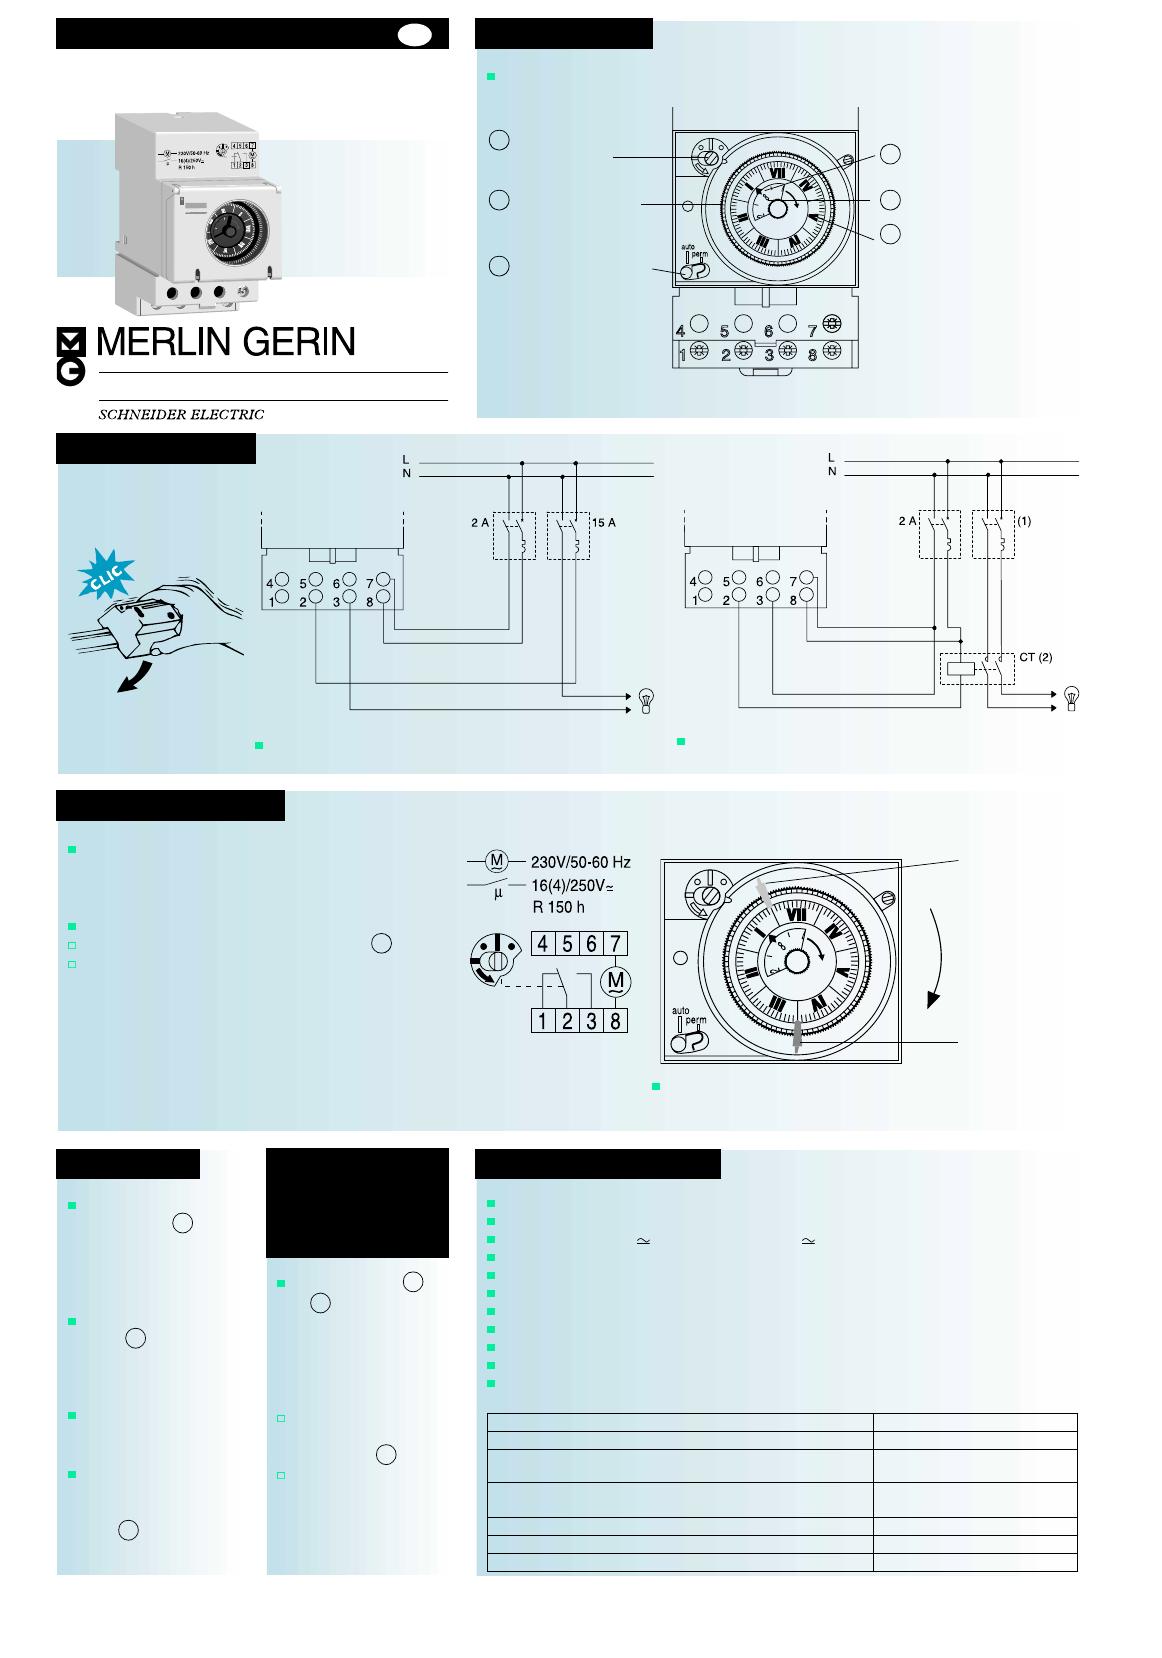 Handleiding Schneider Electric Merlin Gerin Multi 9 Ih 15367  Pagina 1 Van 1   English